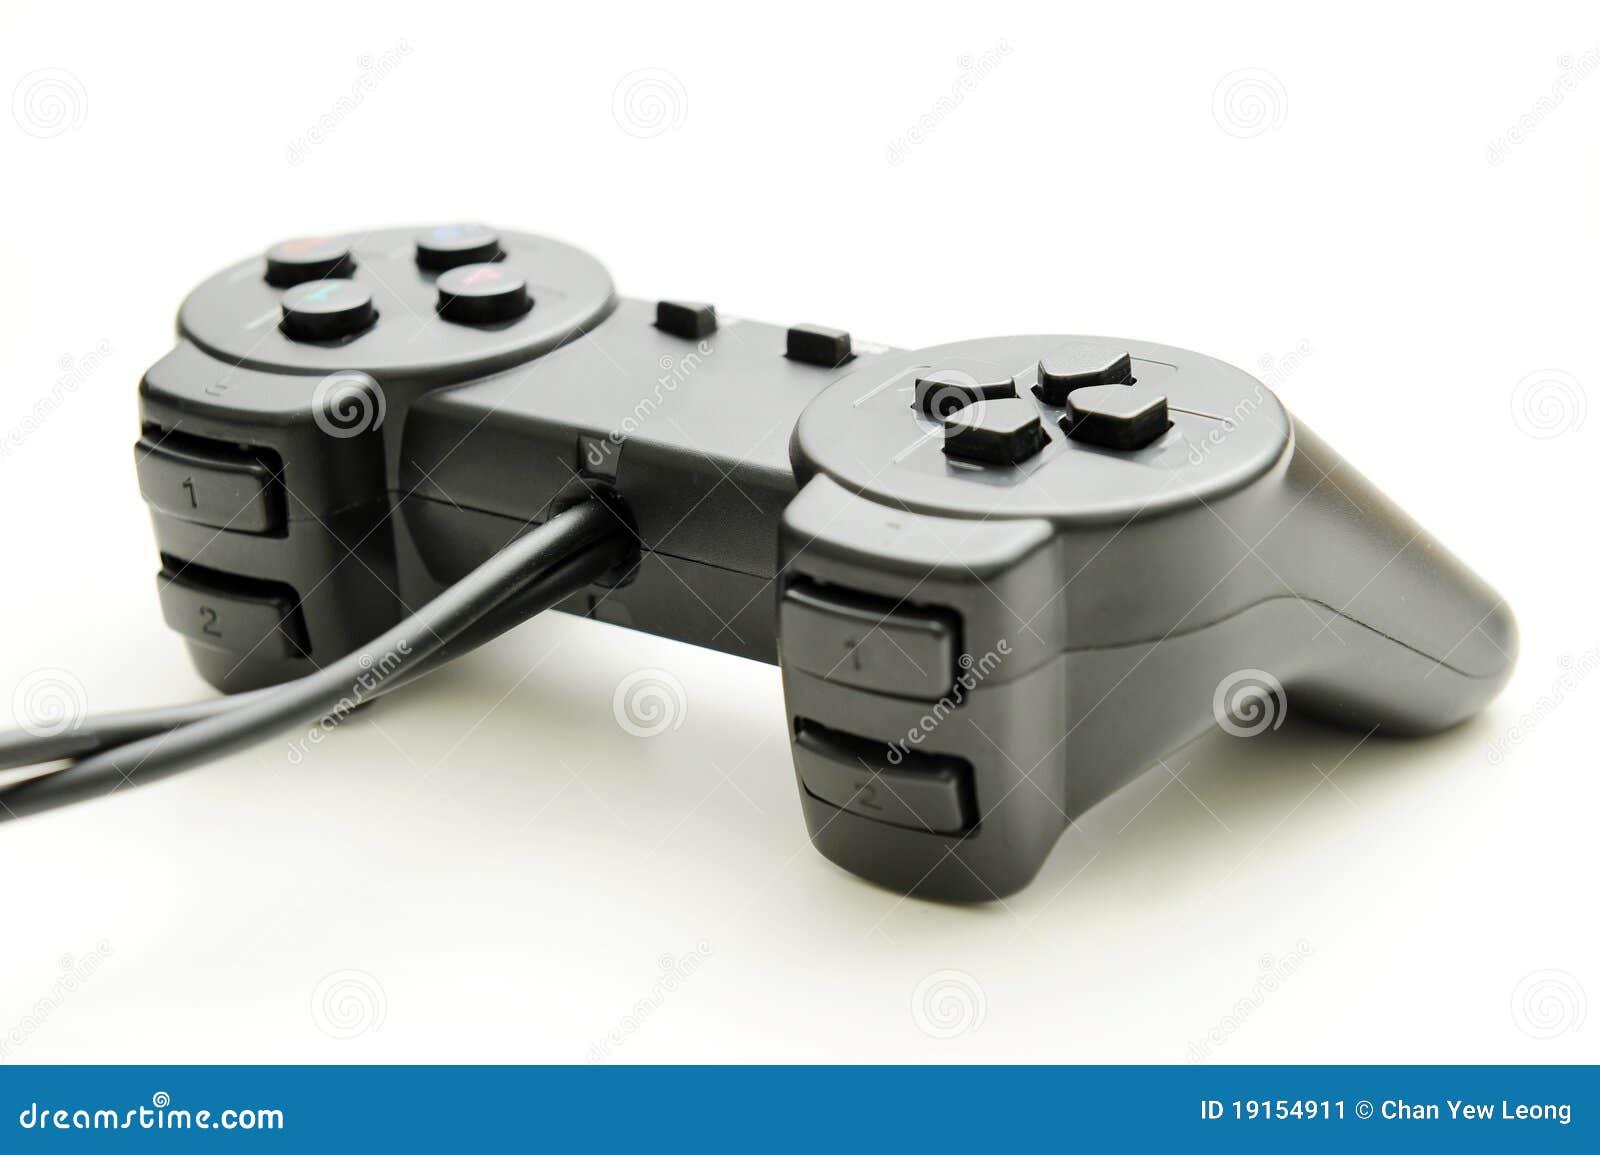 Modern joystick